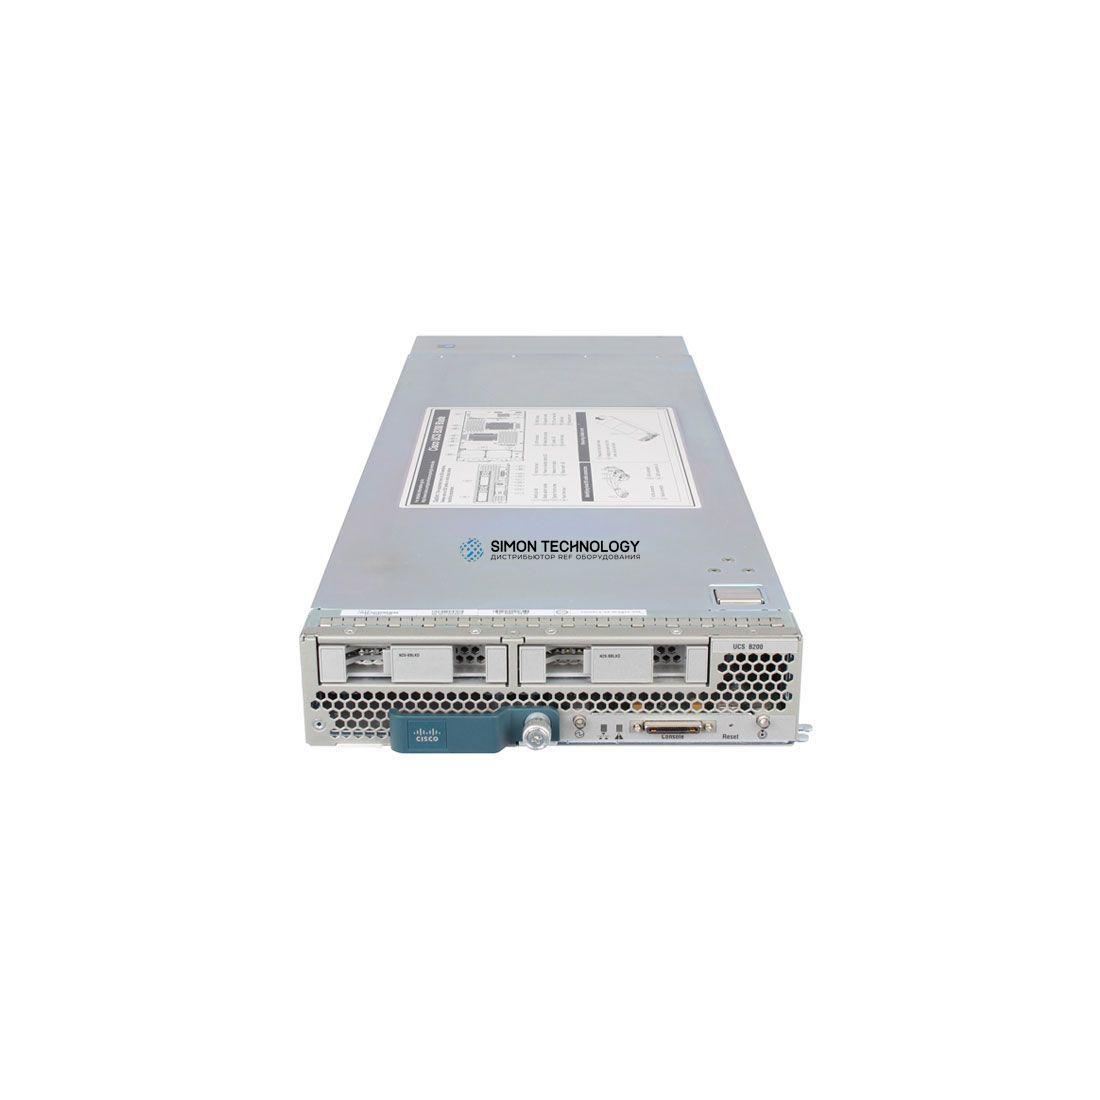 Сервер Cisco CISCO UCS B200 BLADE SERVER (UCS-B200-M1)